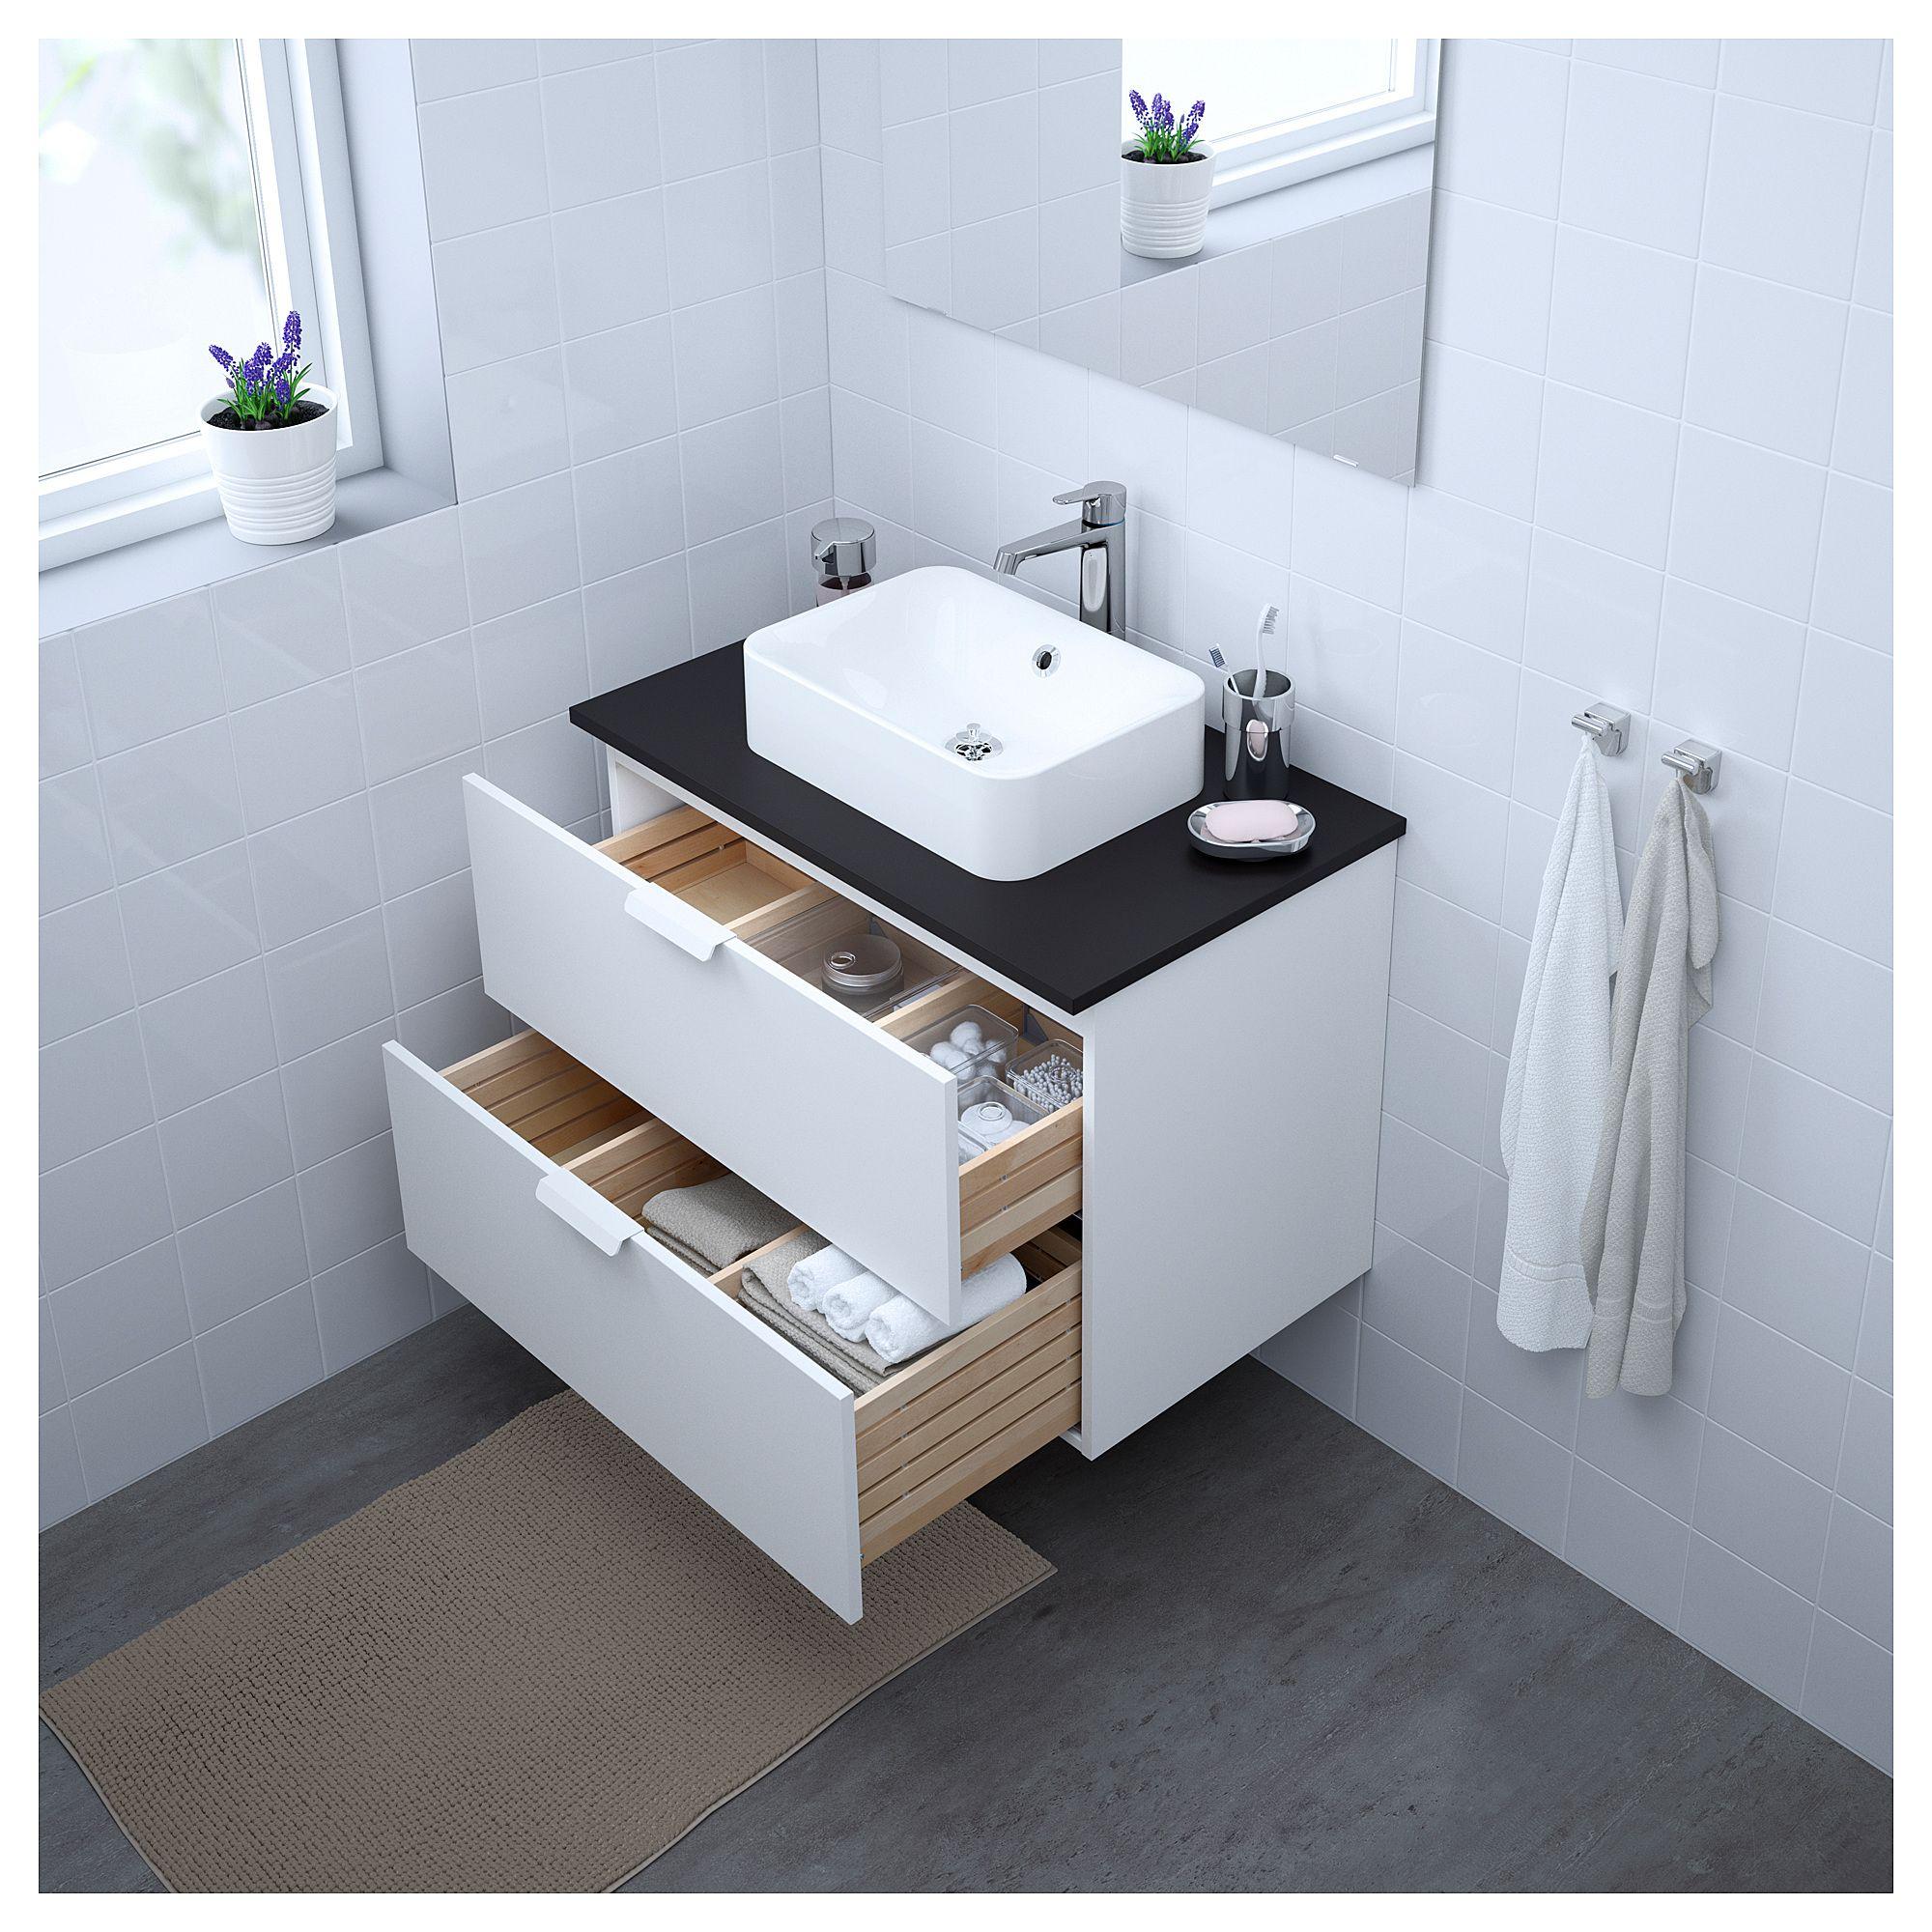 Buy Furniture Malaysia Online Ikea, White vanity